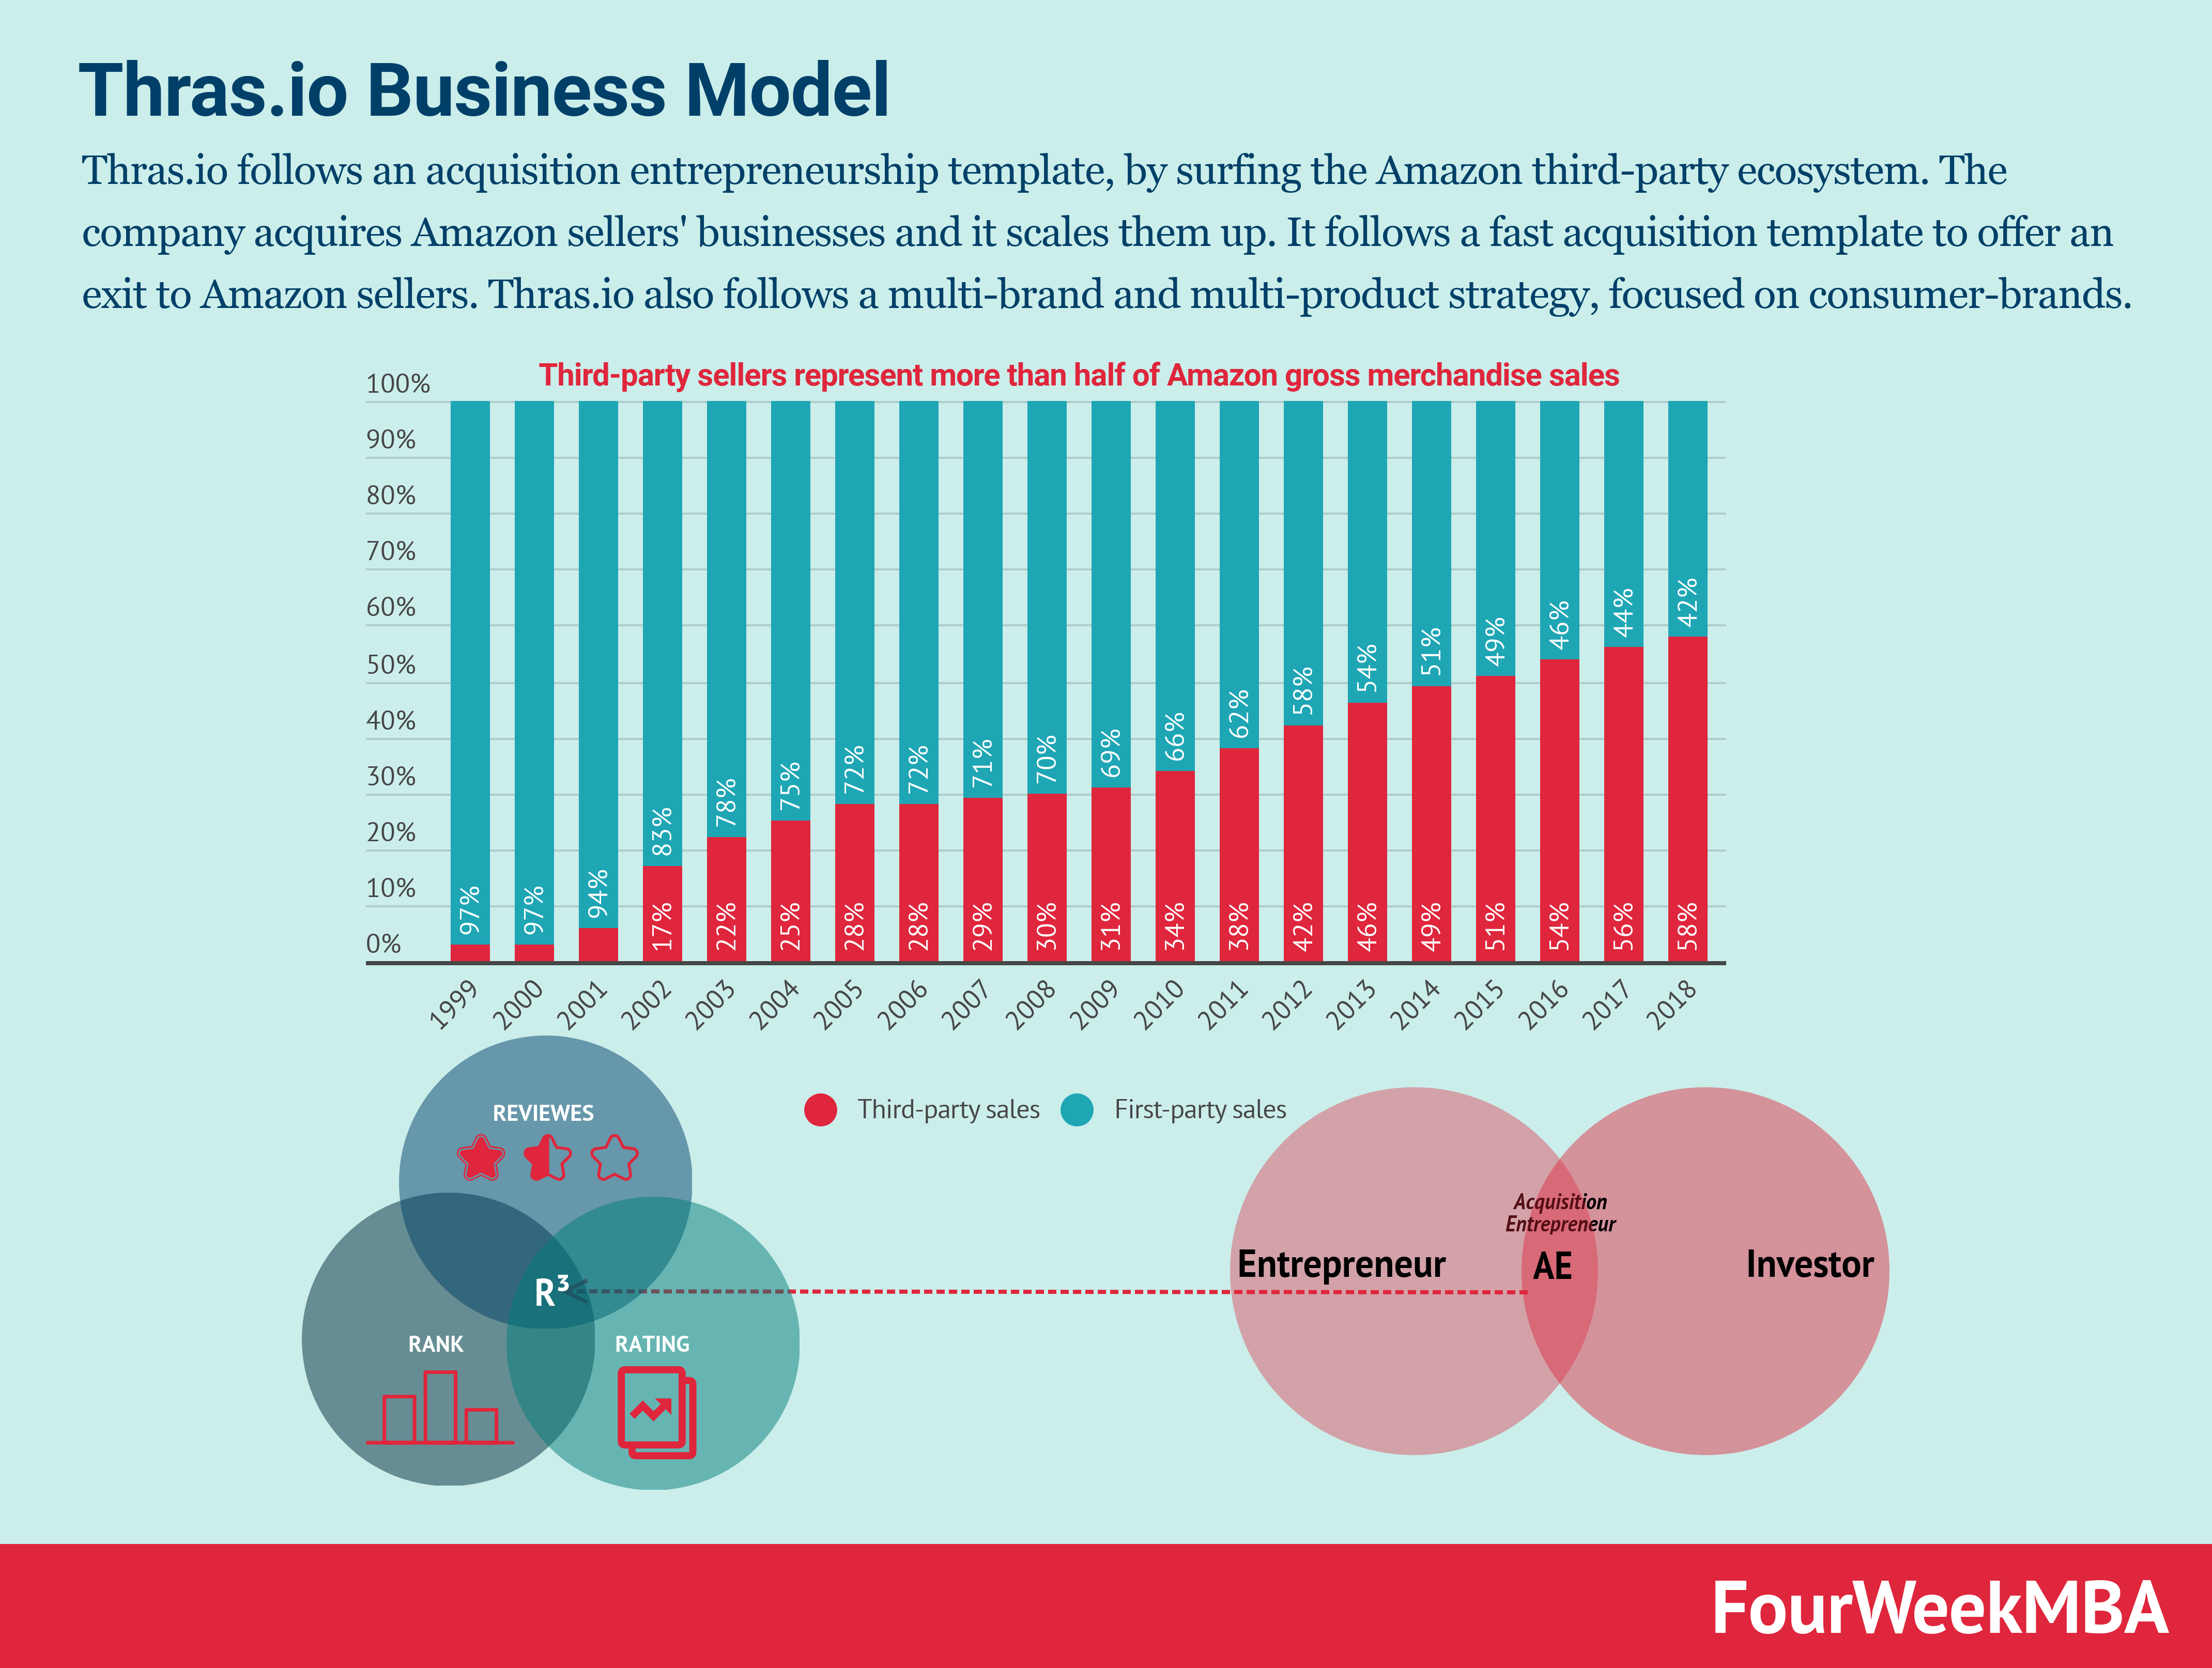 thrasio-business-model